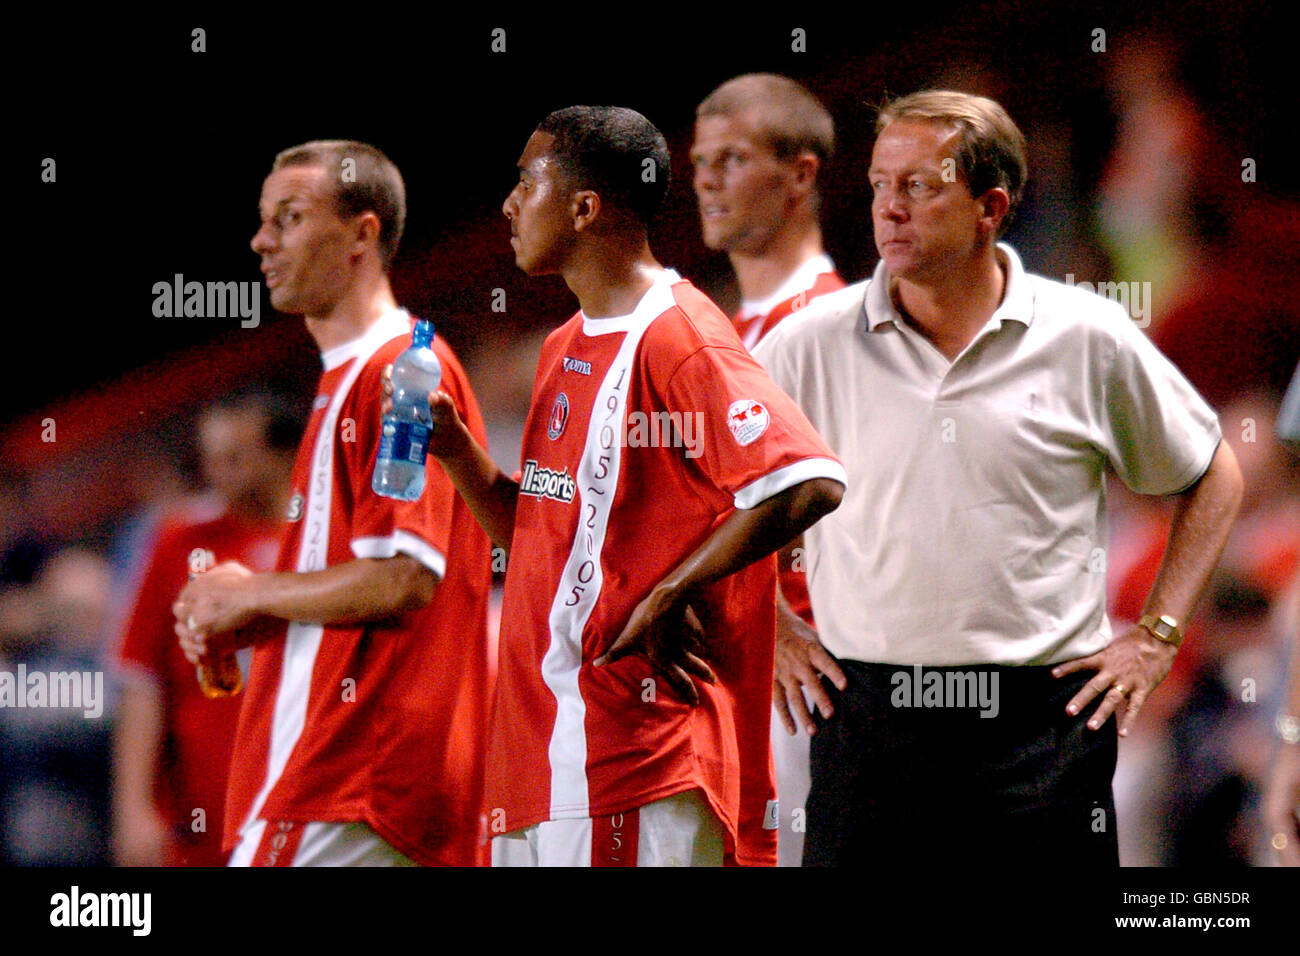 Soccer - Friendly - Charlton Athletic v Chievo Verona - Stock Image